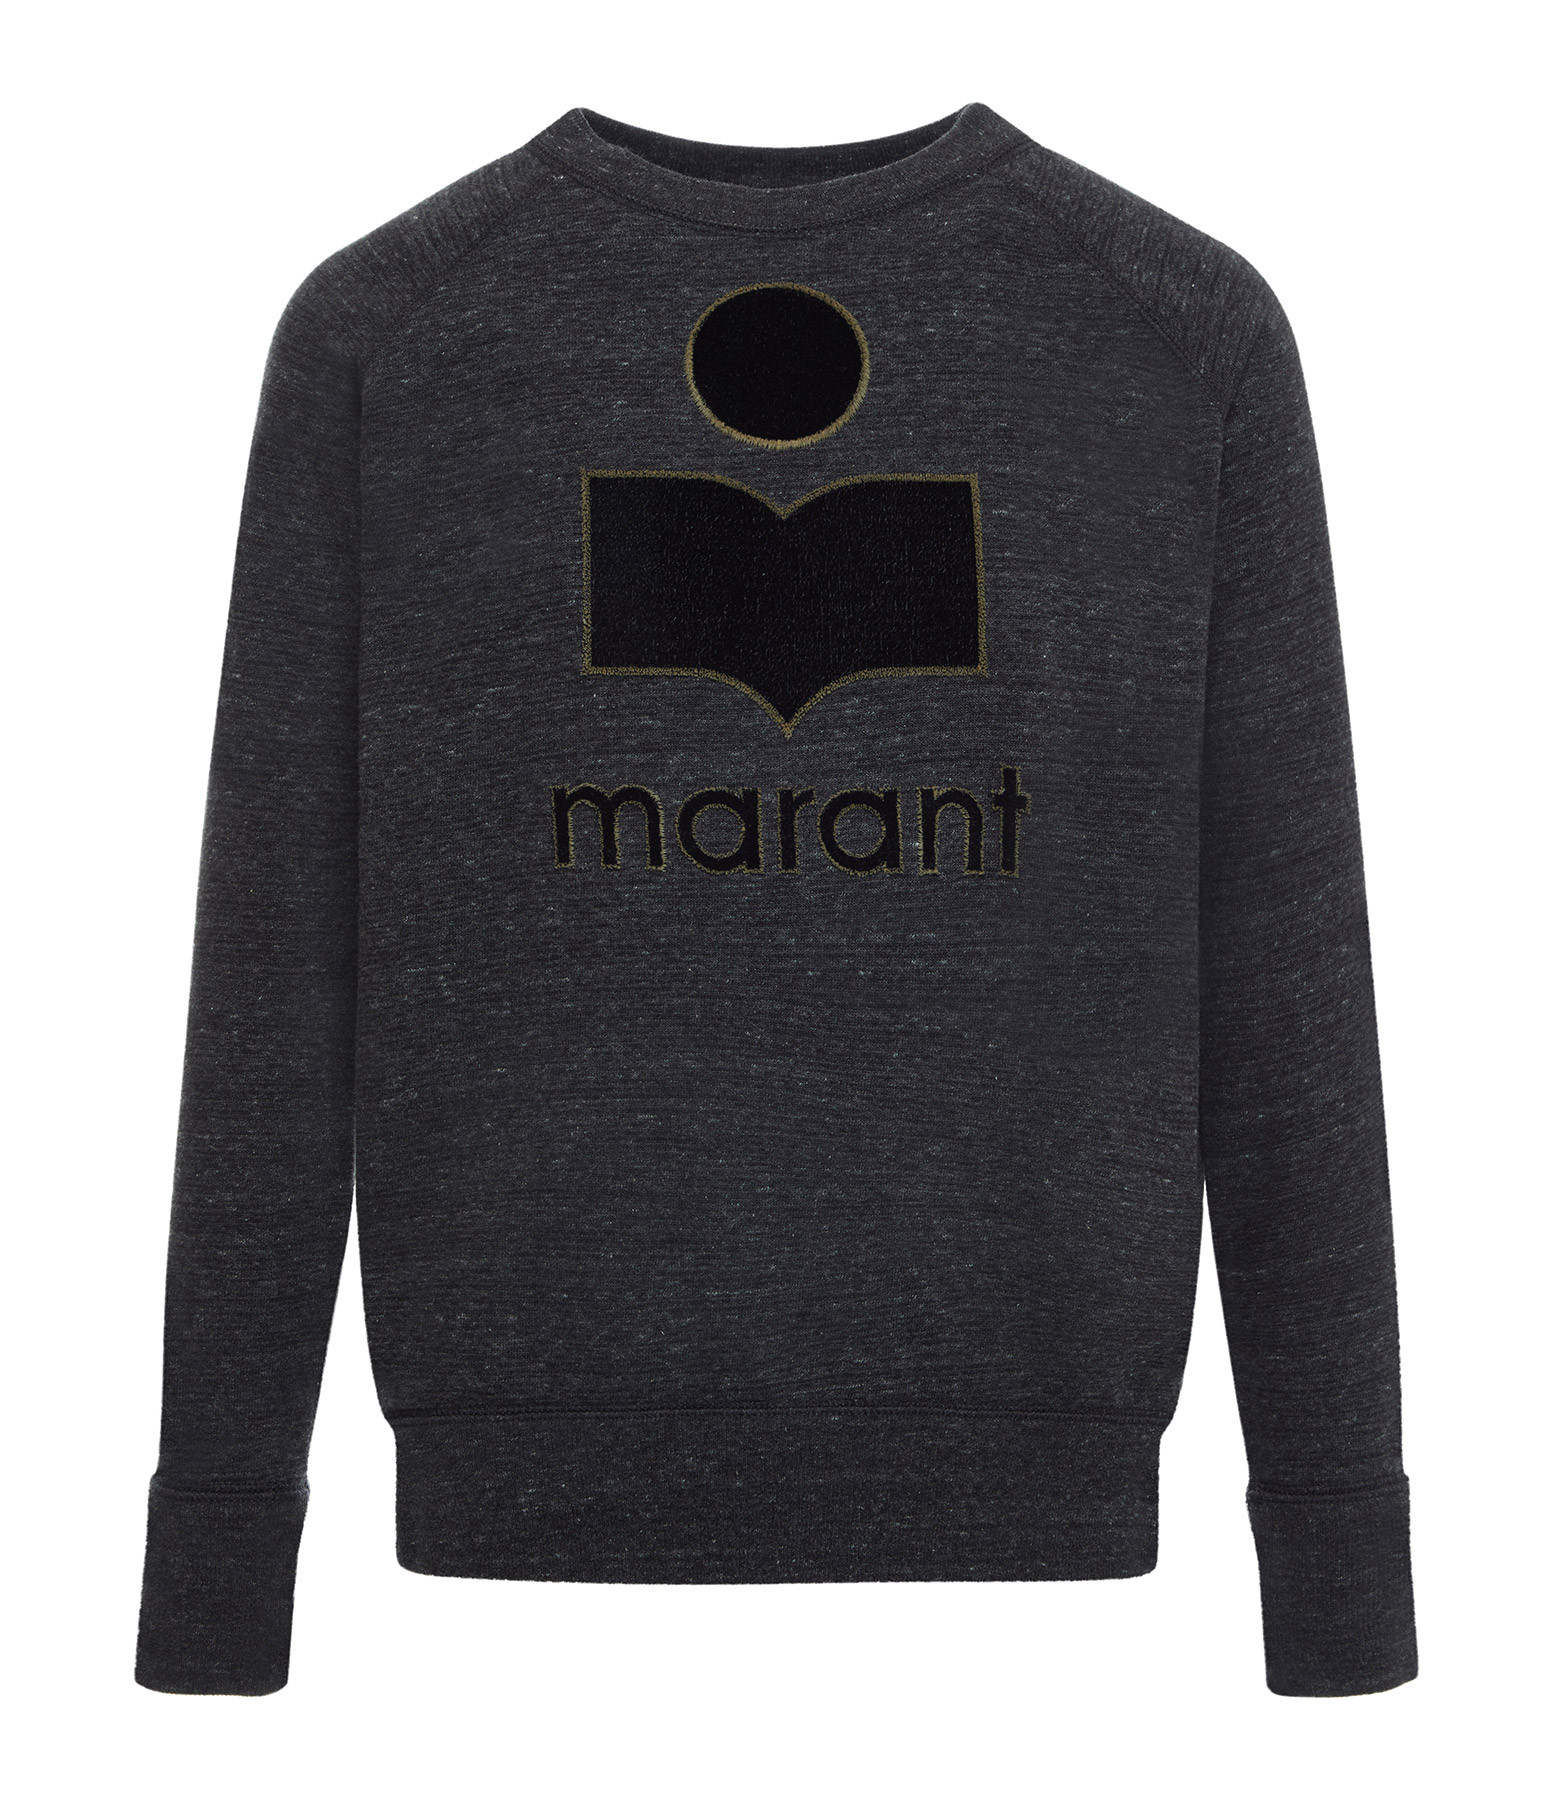 ISABEL MARANT ÉTOILE - Sweatshirt Milly Coton Anthracite